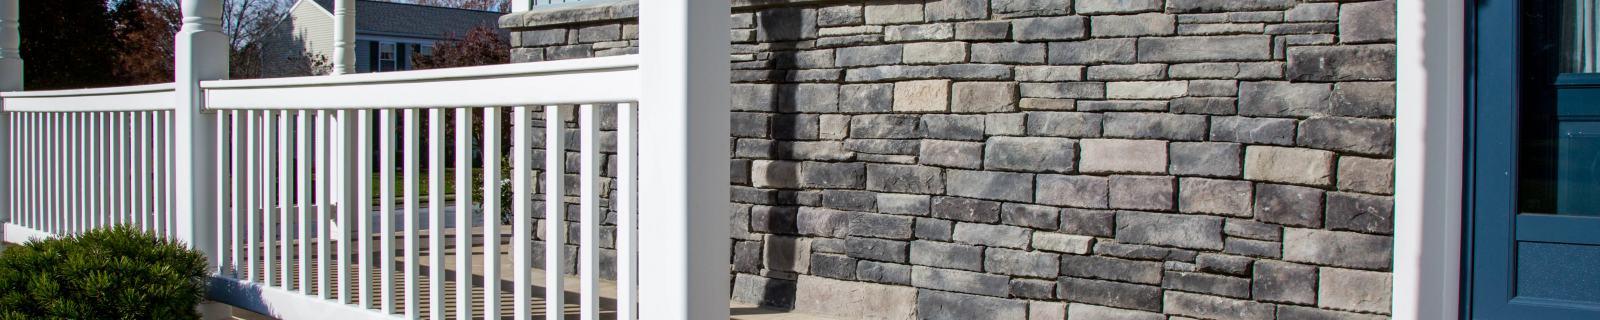 stone wall siding addition